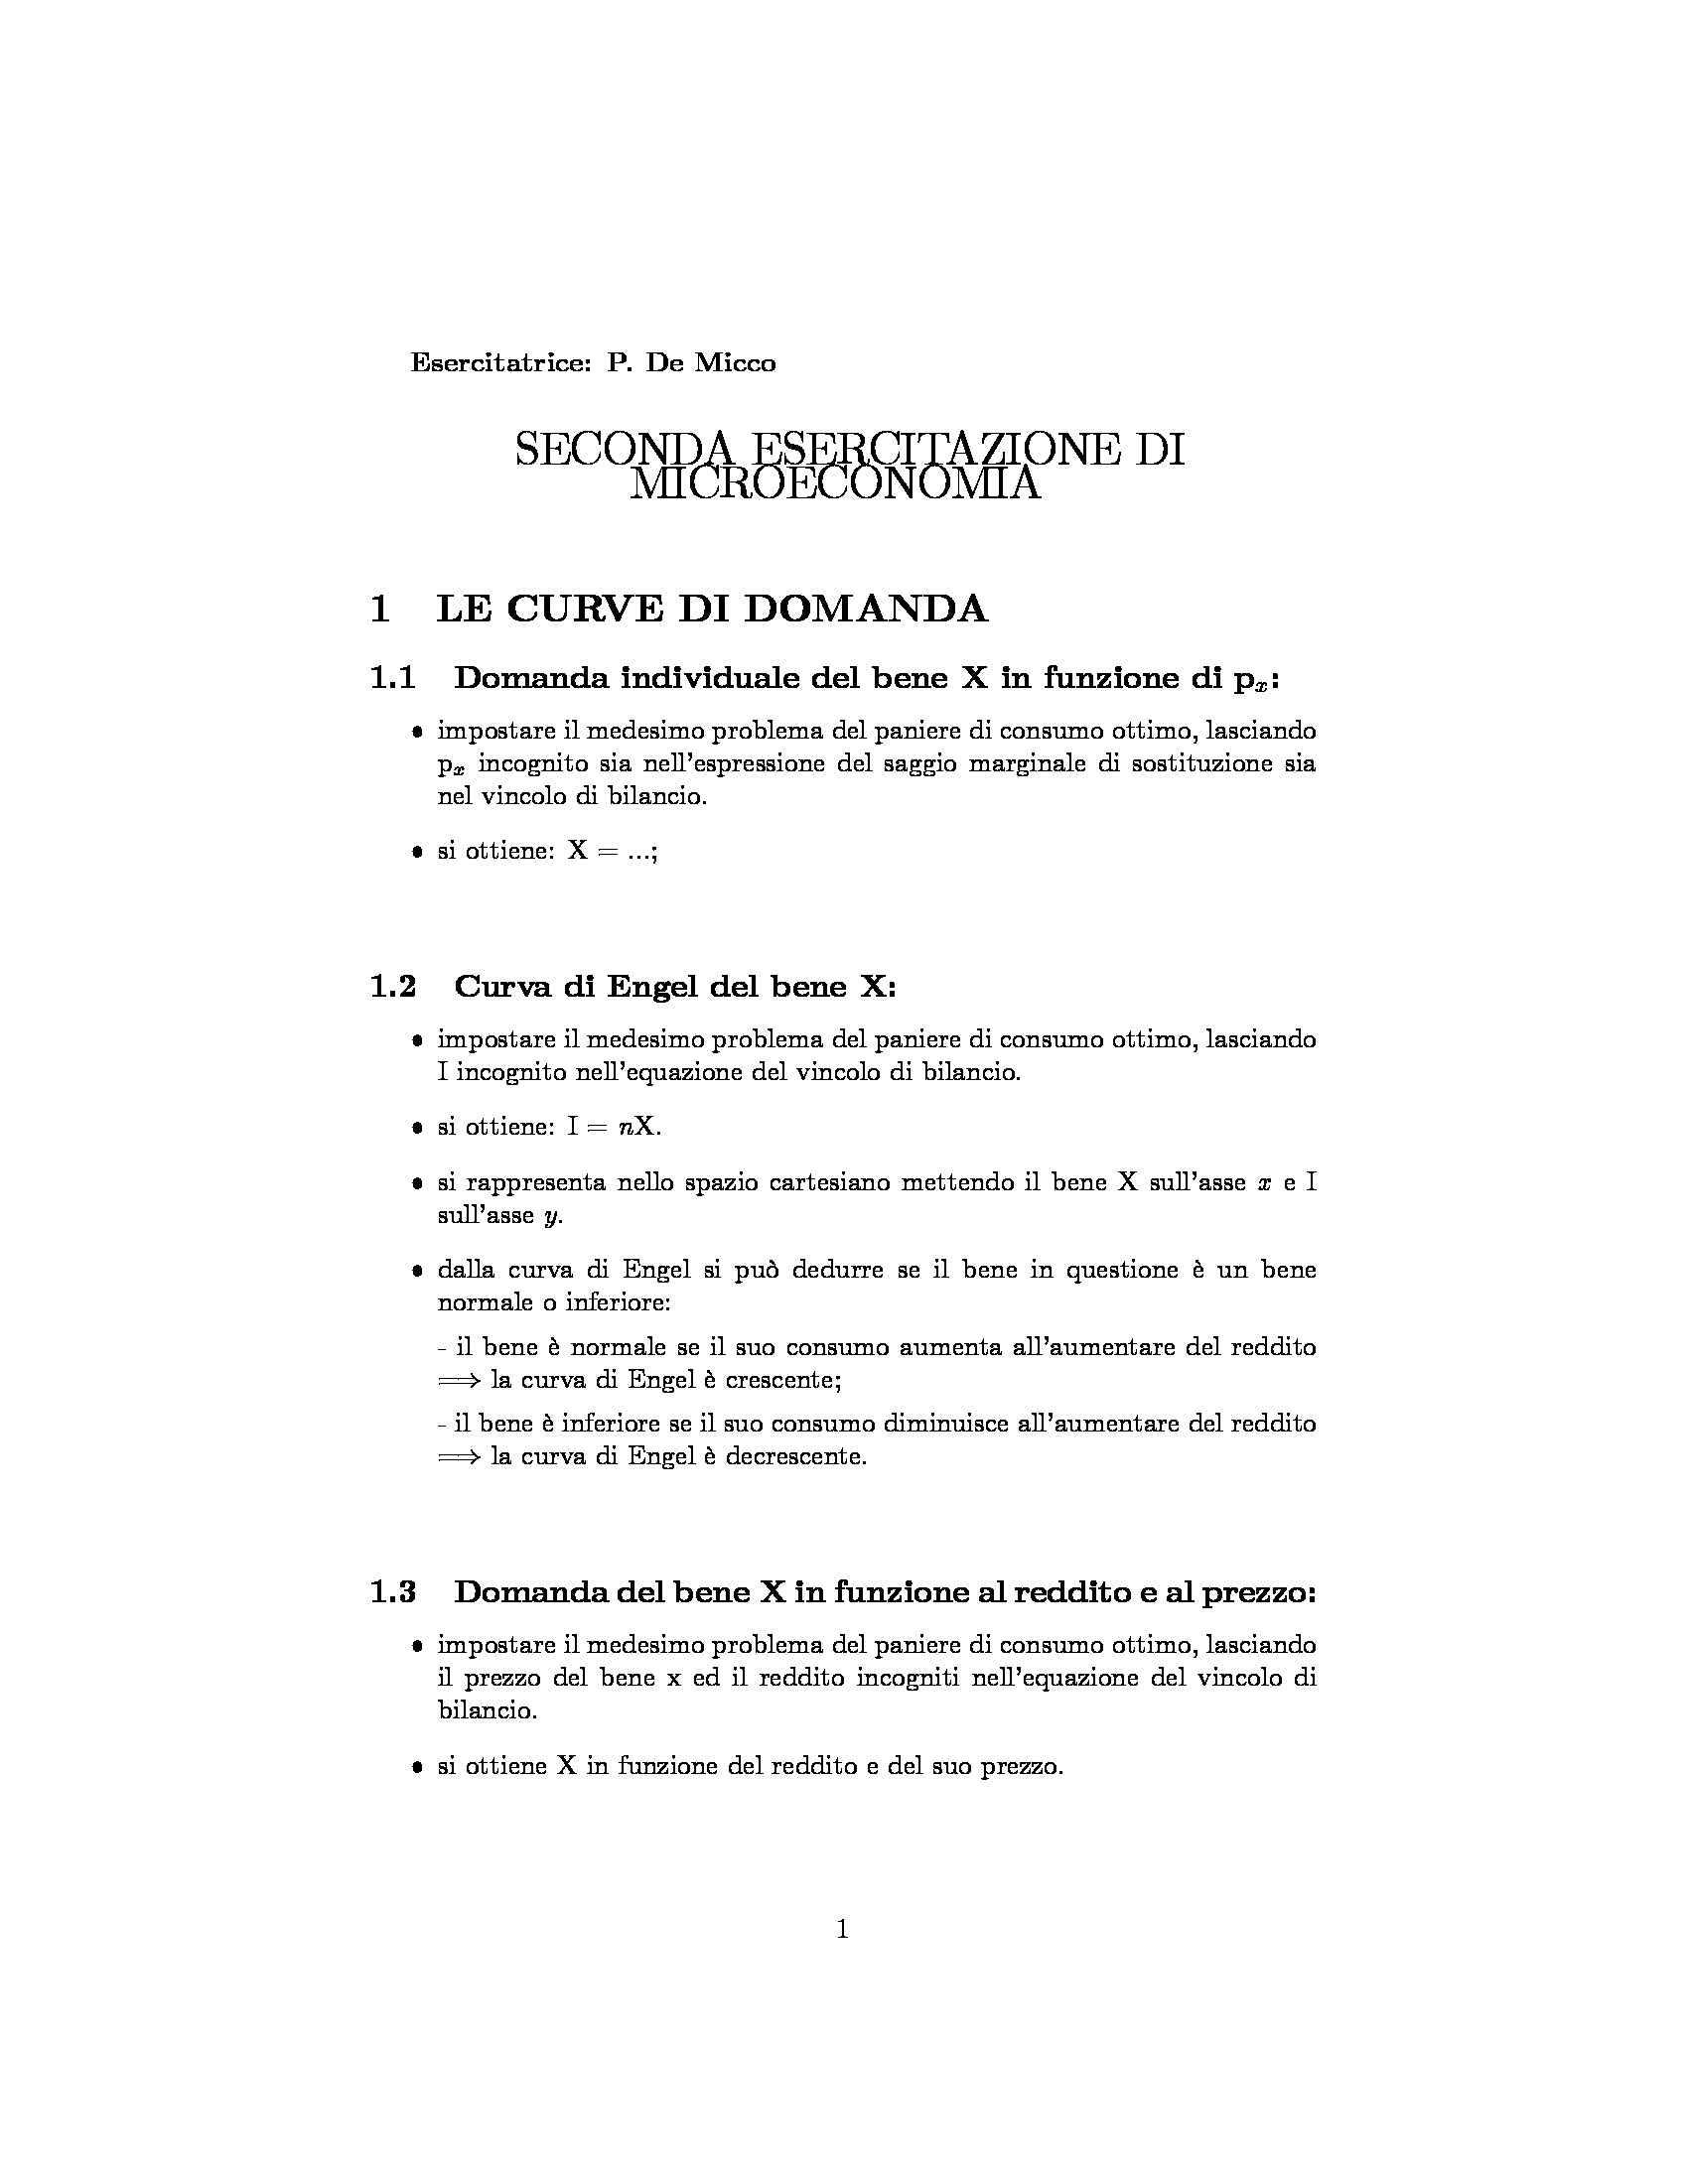 Microeconomia - Formulario Pag. 6